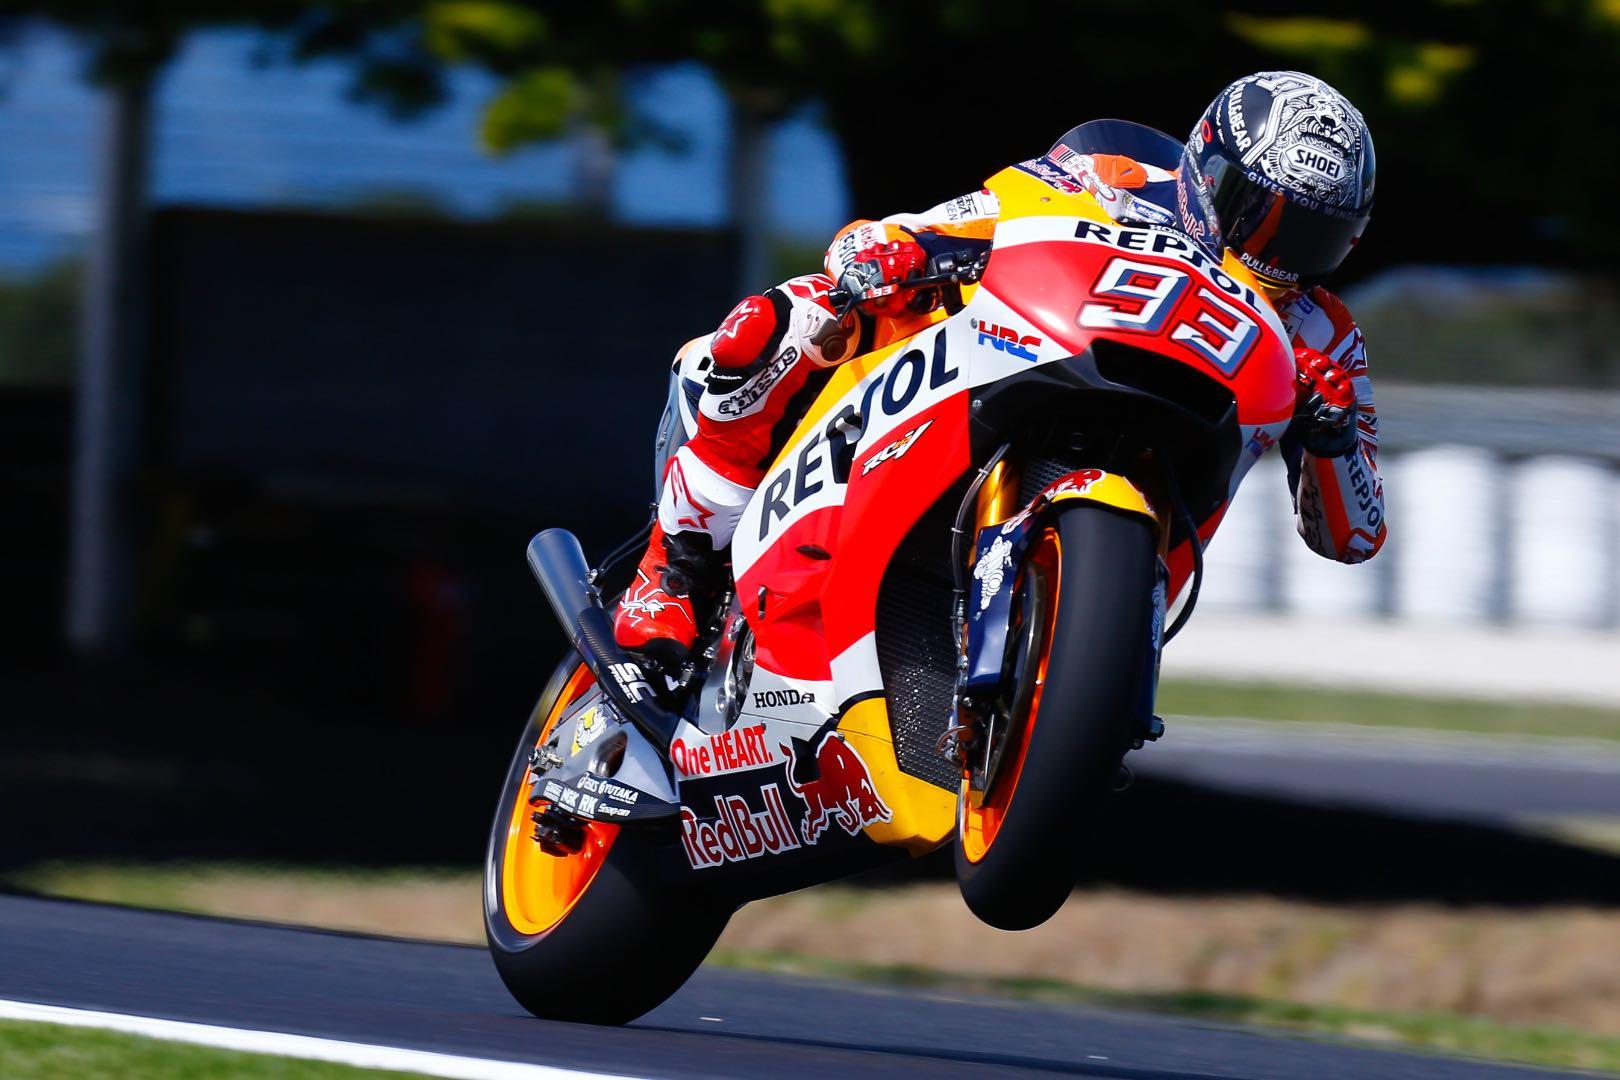 2018 Sachsenring MotoGP Preview: Honda Marc Marquez